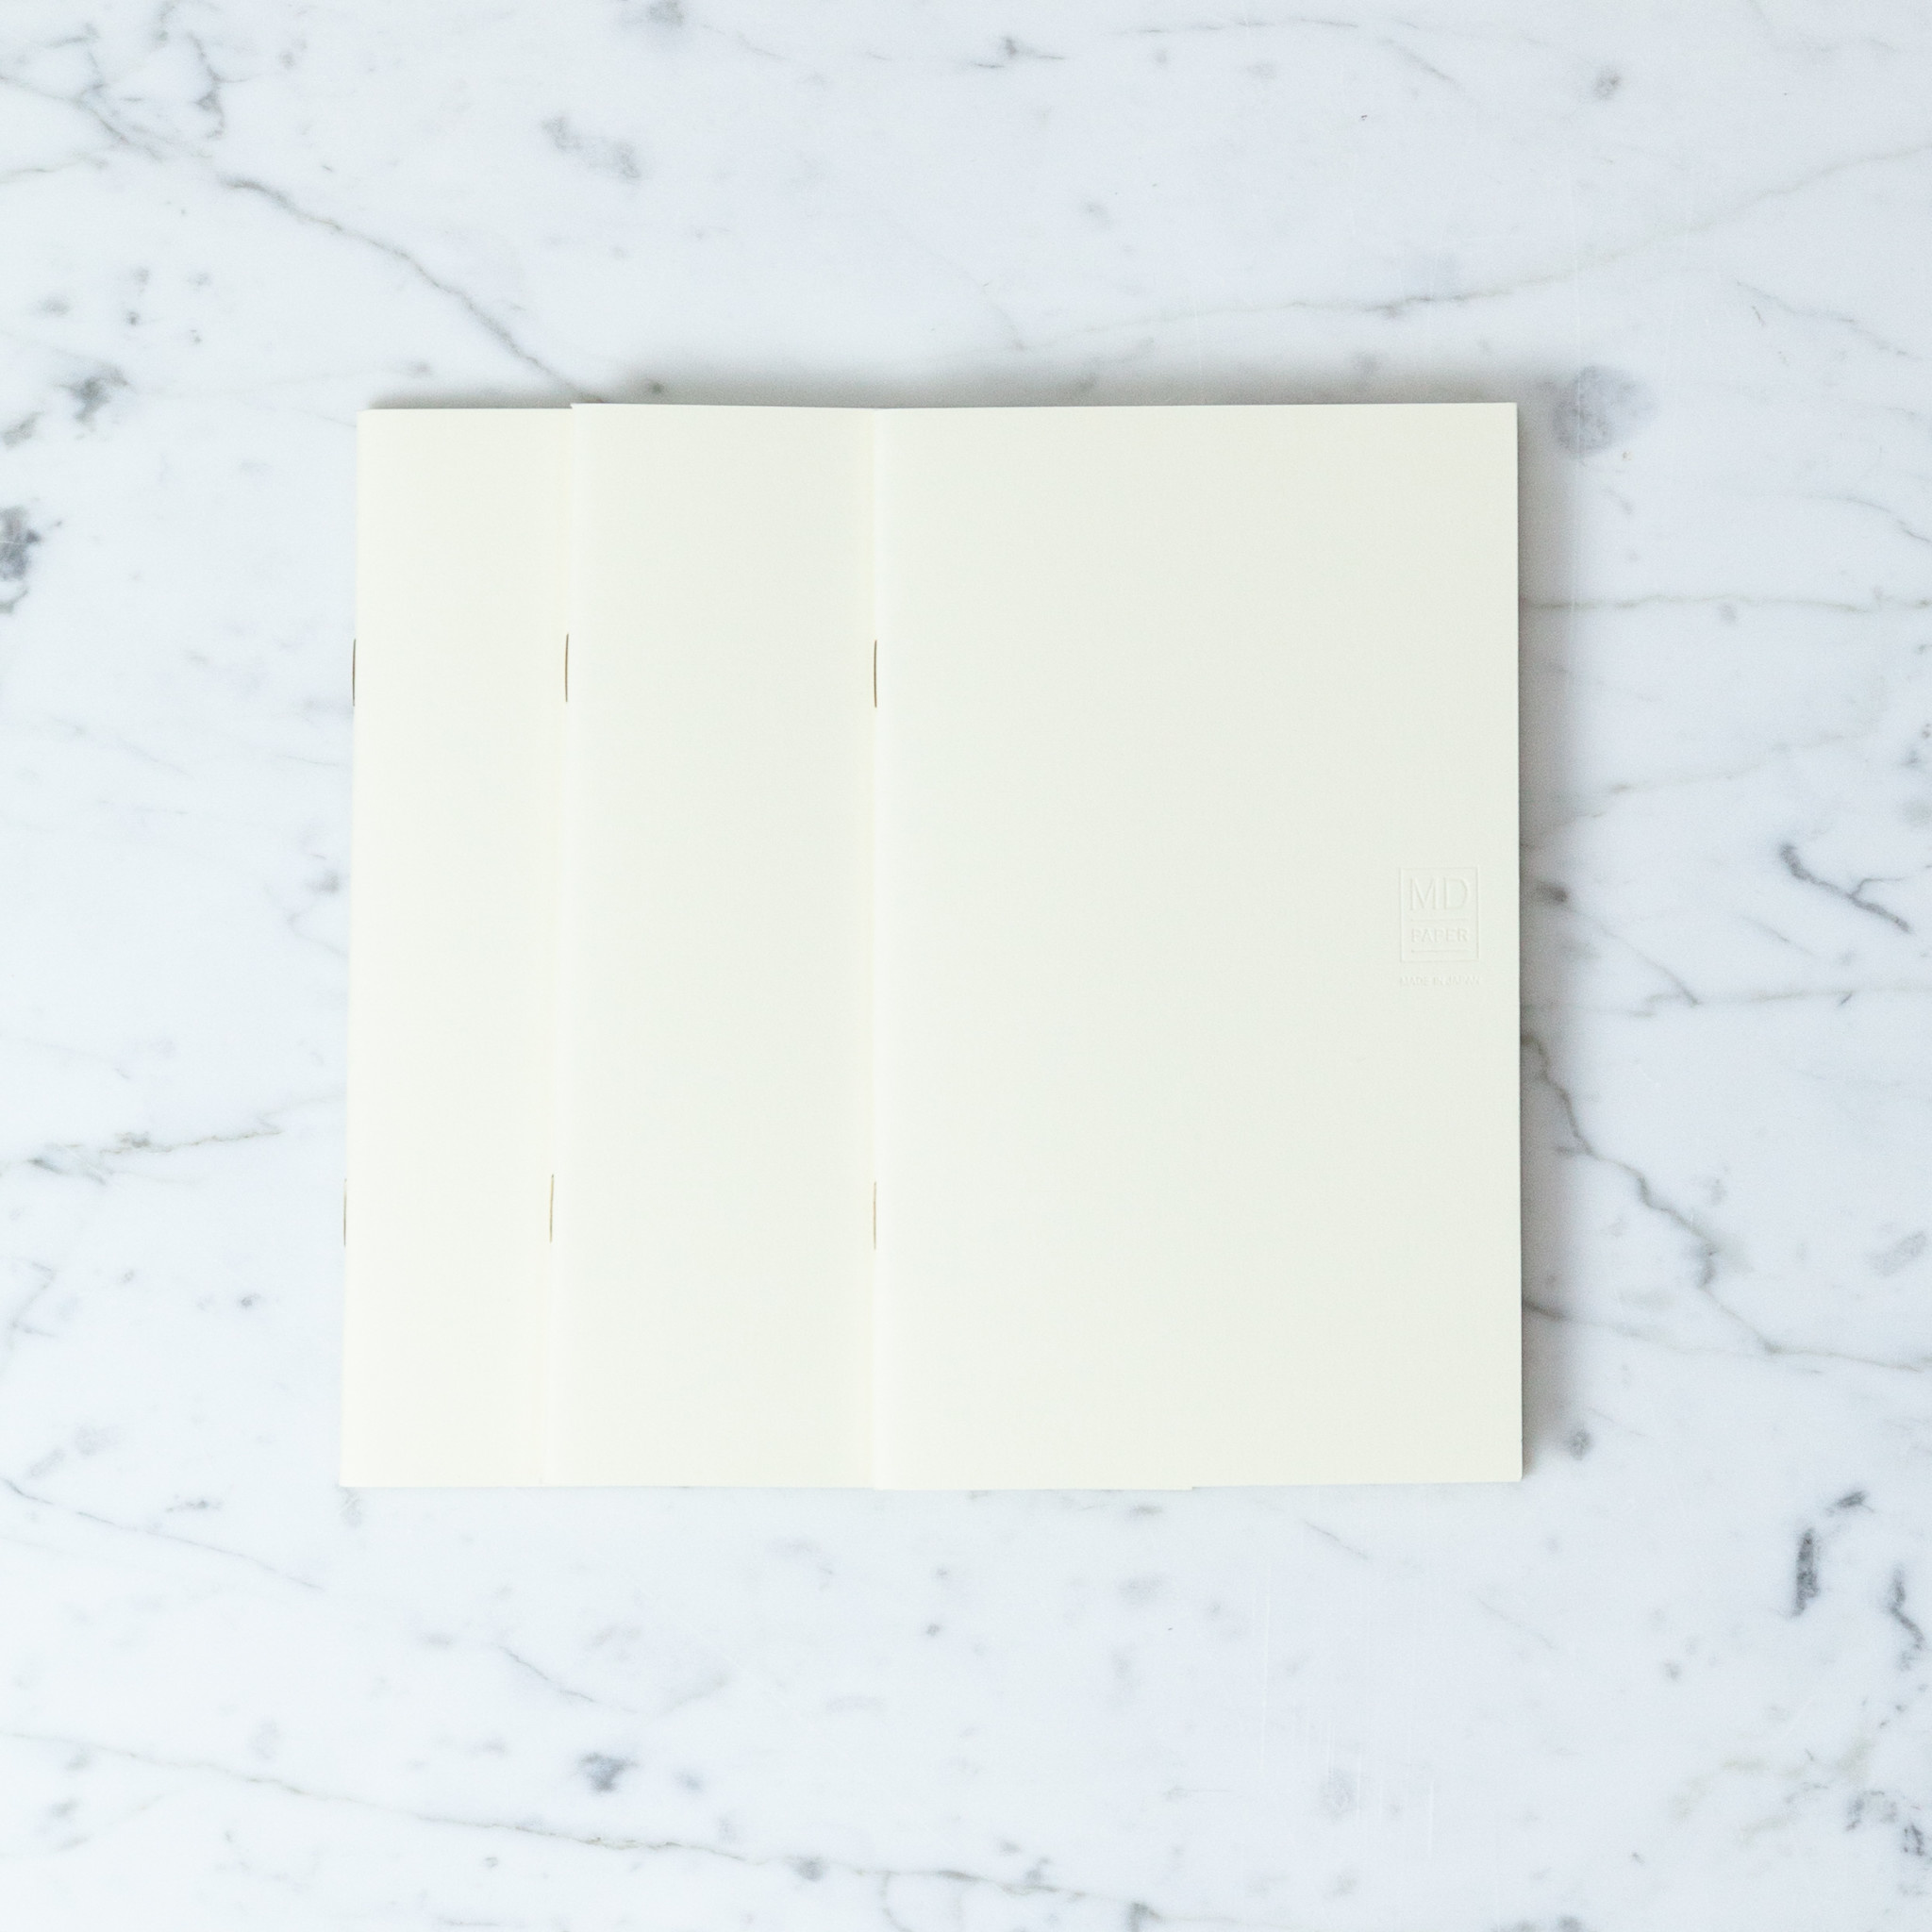 Midori Simple Notebook B6 - Blank - 3 Pack